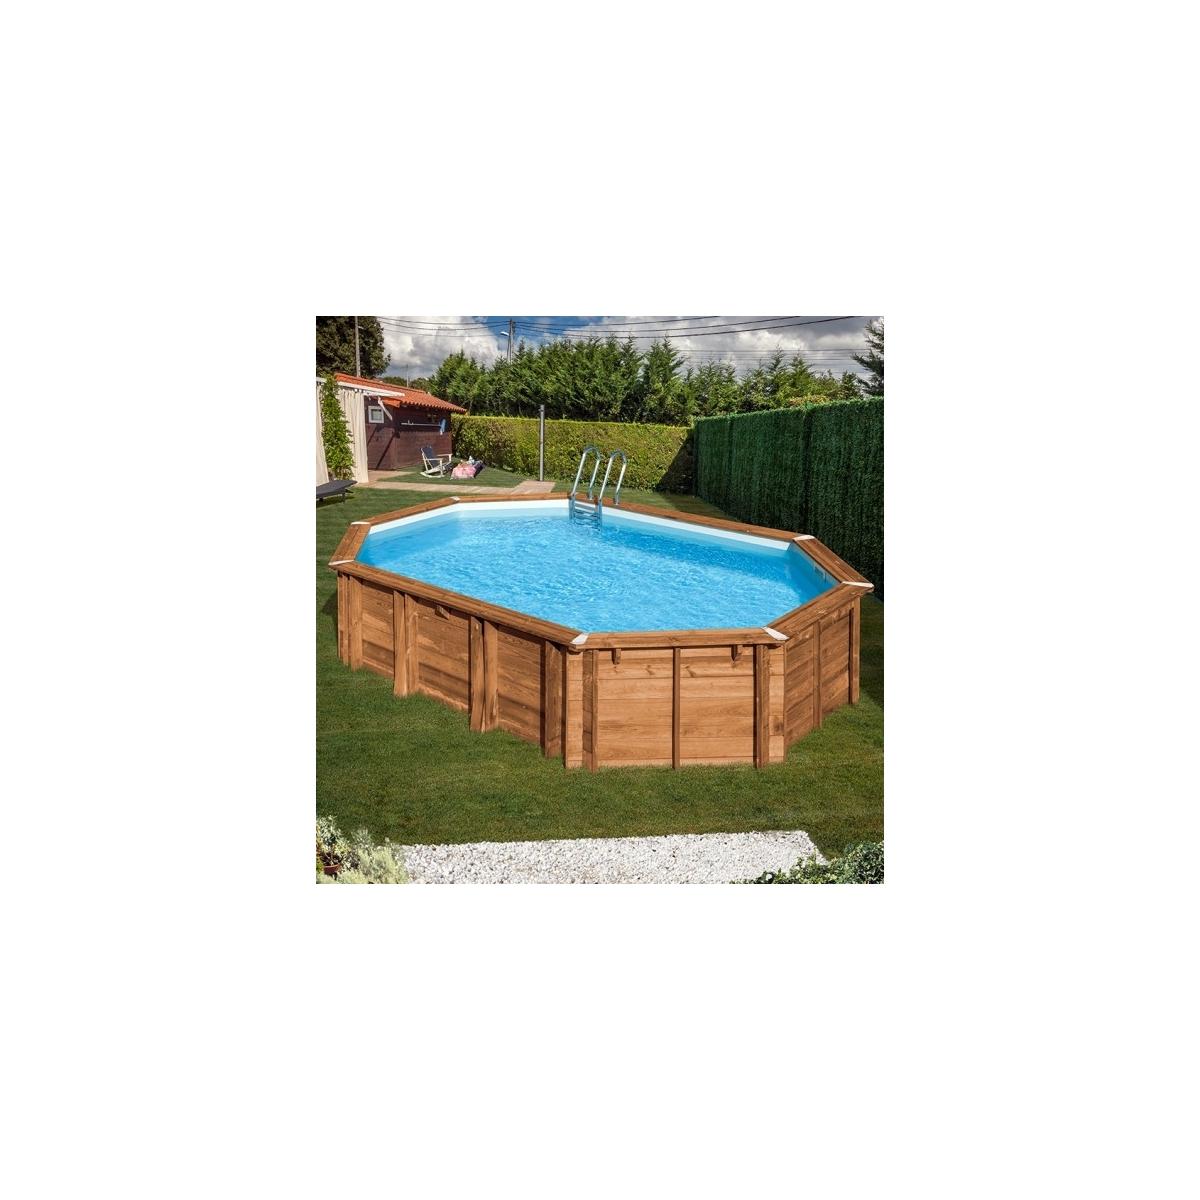 Piscina desmontable de madera Gre Sunbay Avocado ovalada 656x456x131